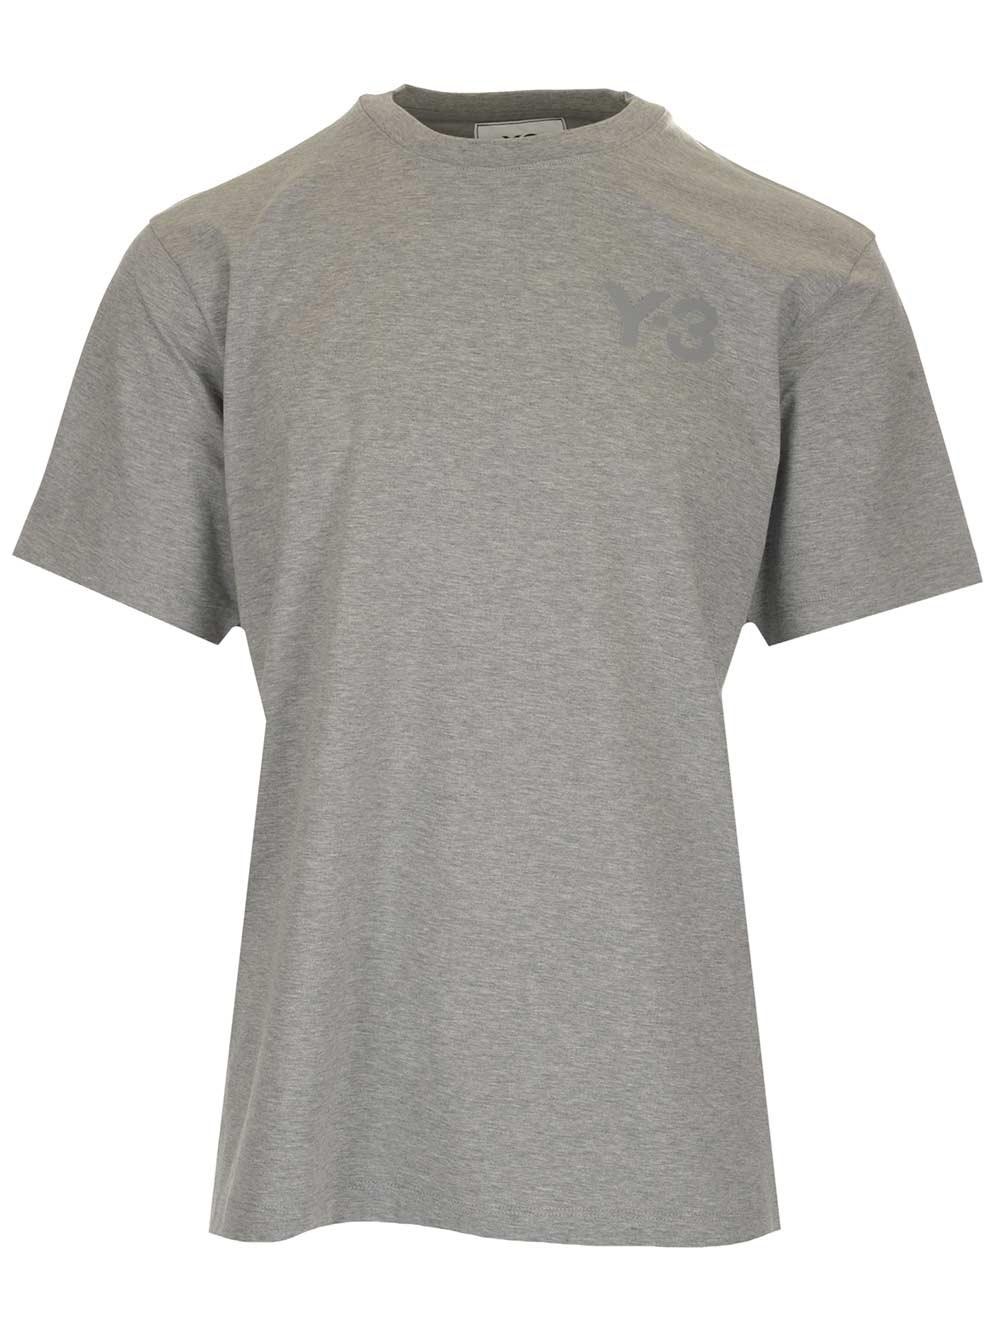 ADIDAS Y-3 Grey Oversize T-Shirt